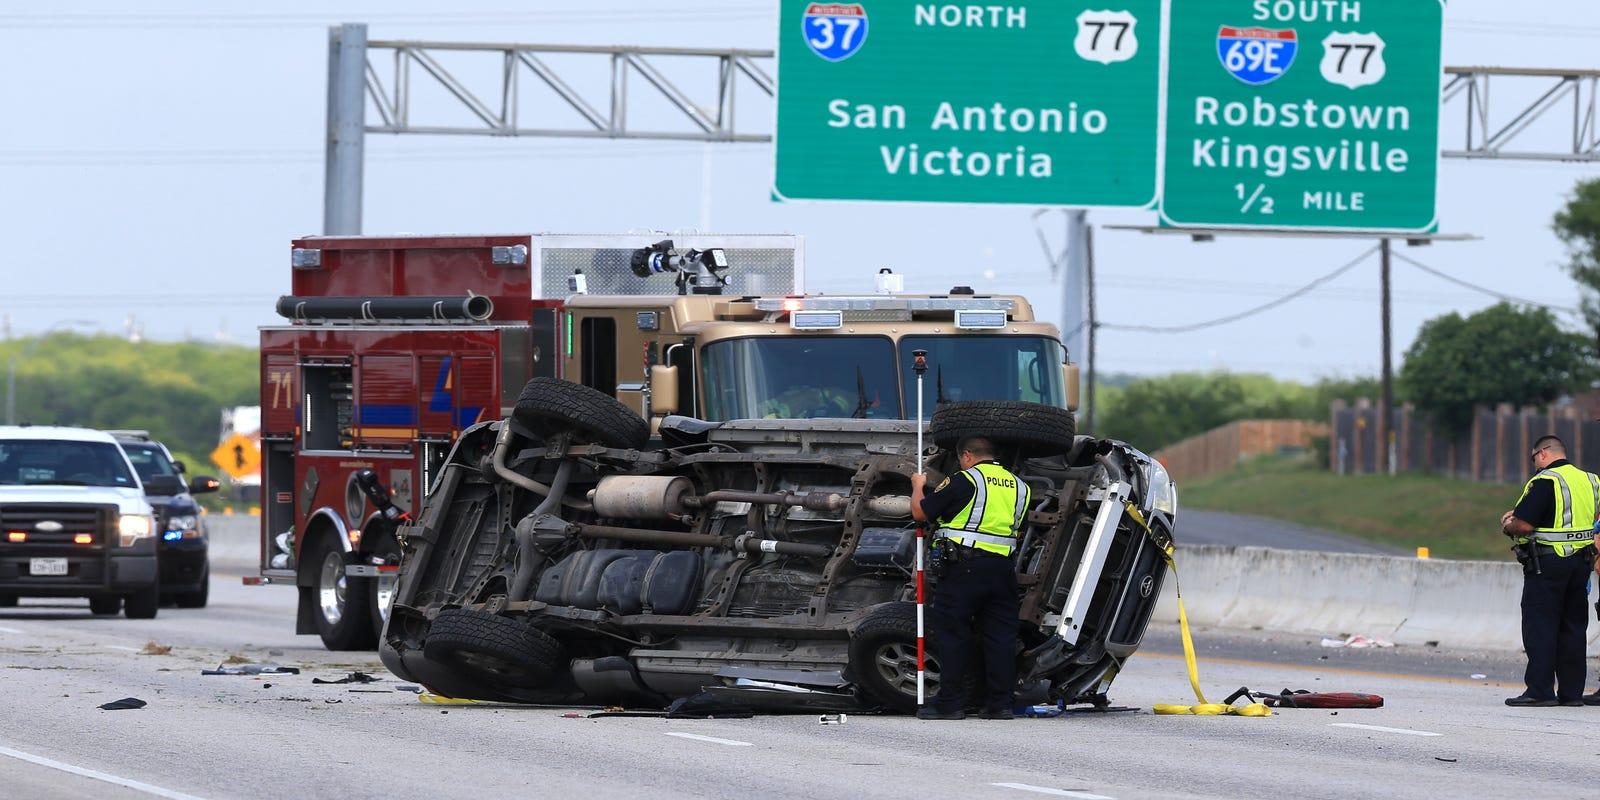 Police investigate fatal accident on I-37 near Calallen